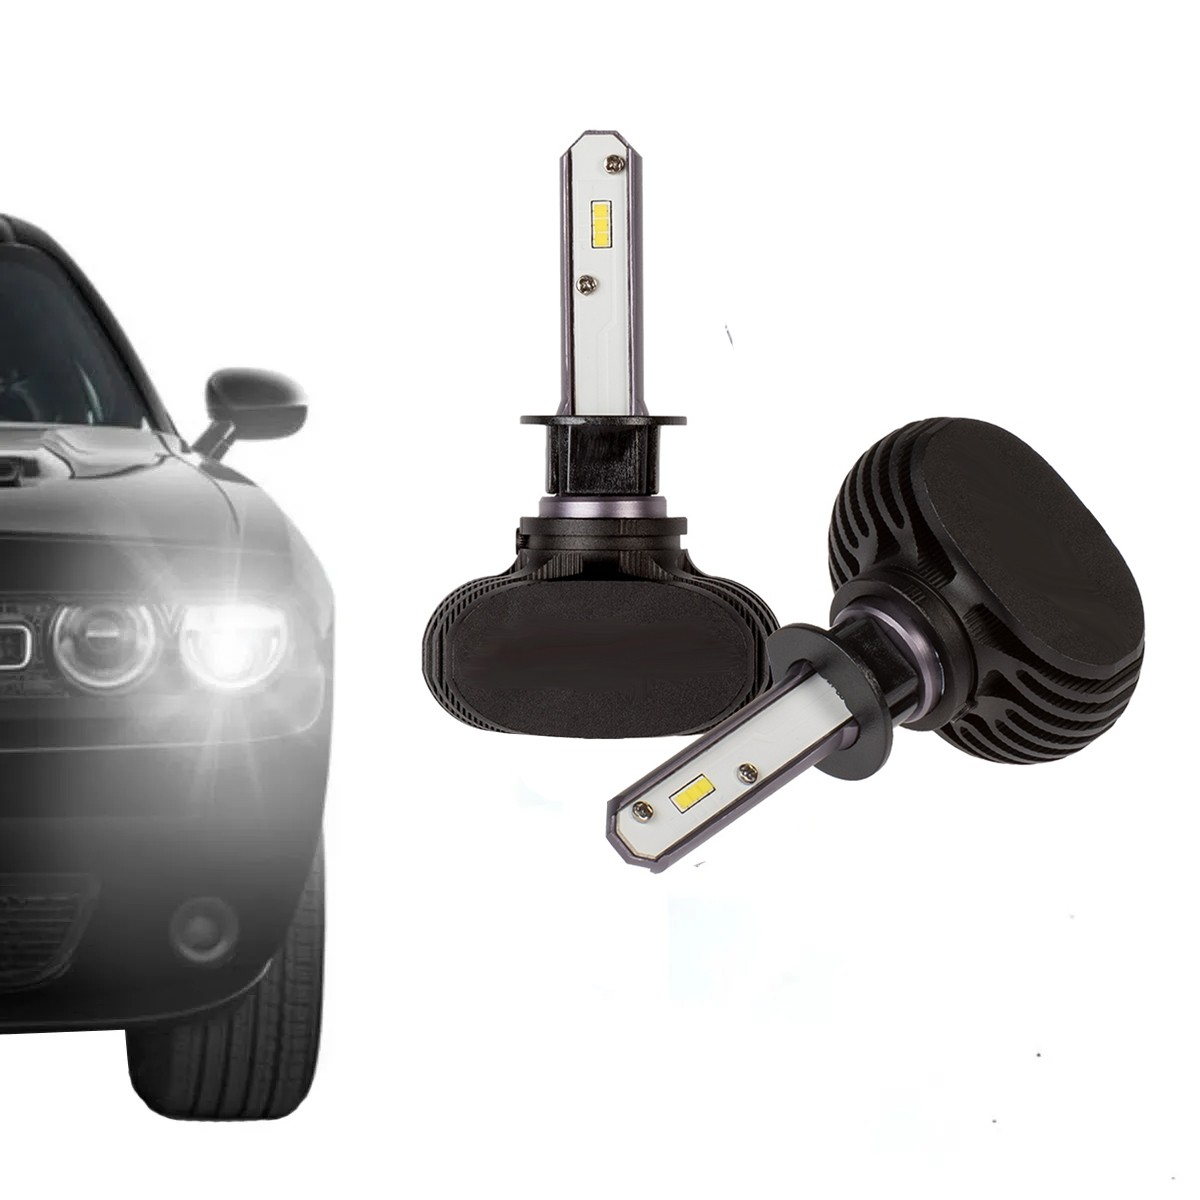 Lampada Led 2D Carro HB3 9005 6000K 12V-24V 32W Headlight GM Honda Jeep Toyota Civic Hilux Corolla Cruze Ranger Camaro Yaris